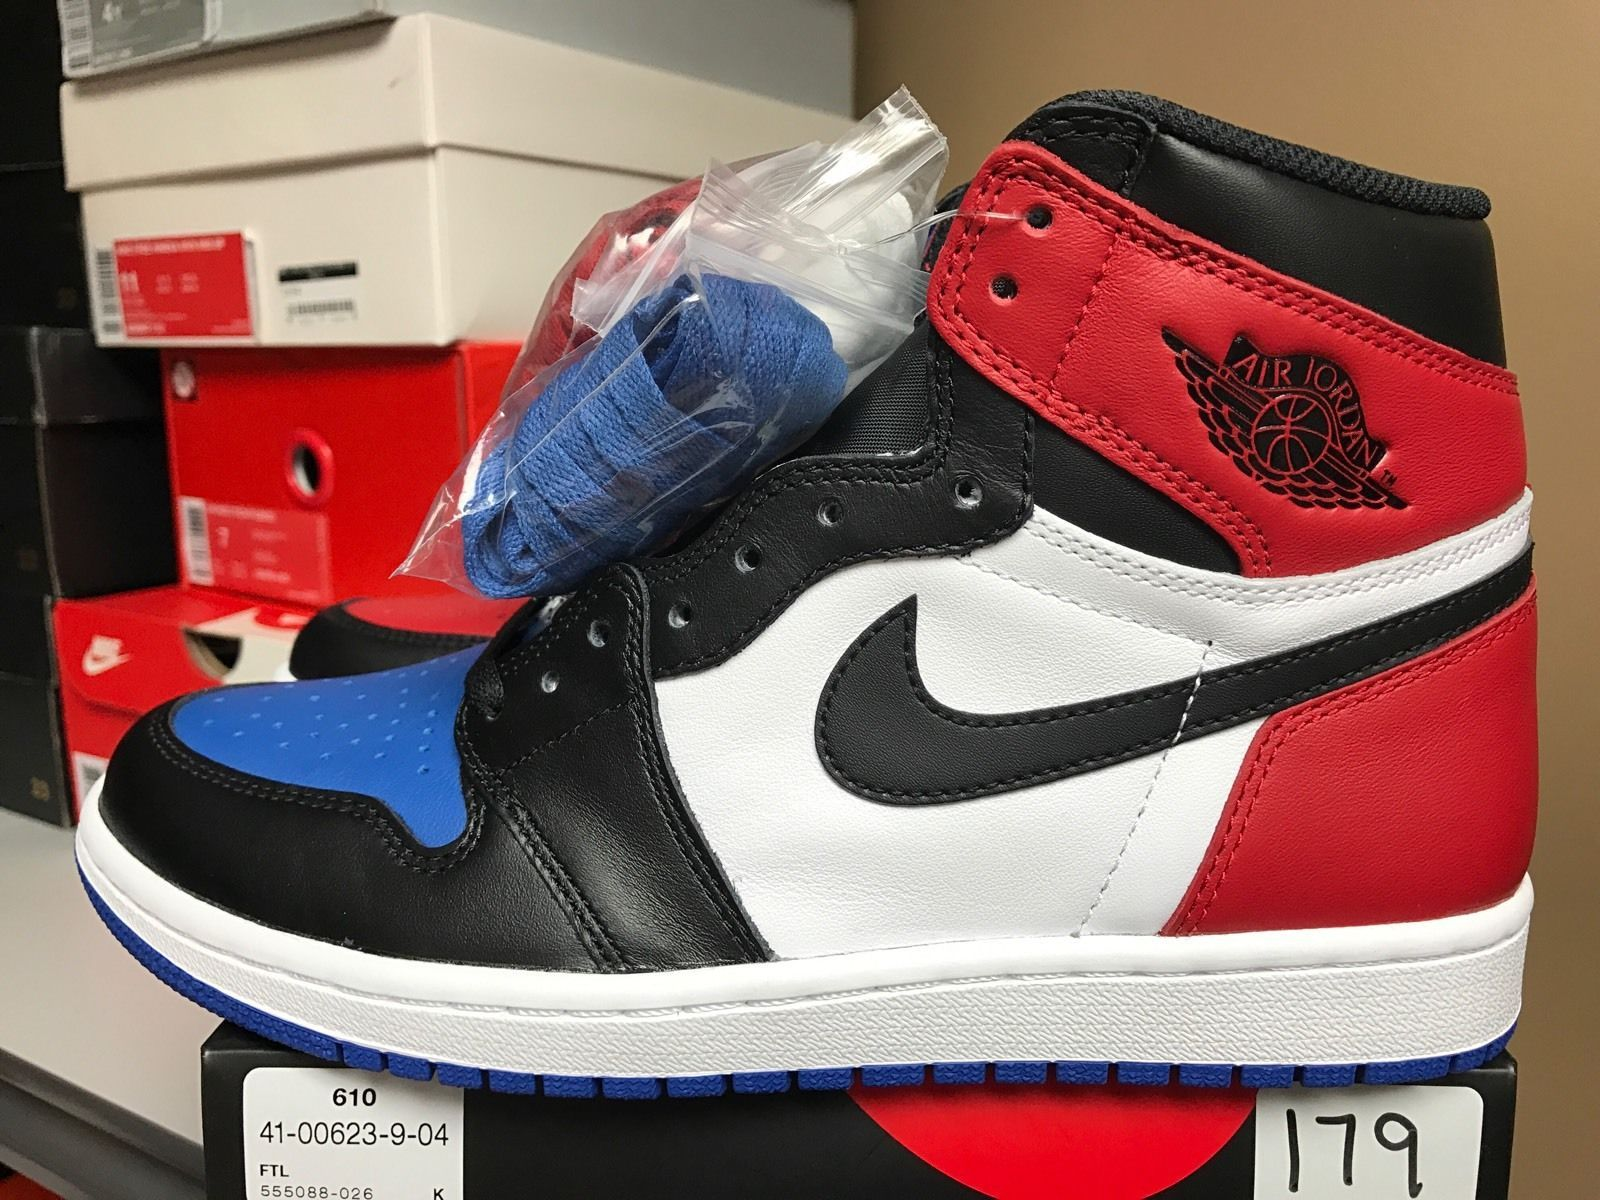 Ds Nike Air Jordan 1 Top 3 Retro Red Blue Black High Og Size 8 New